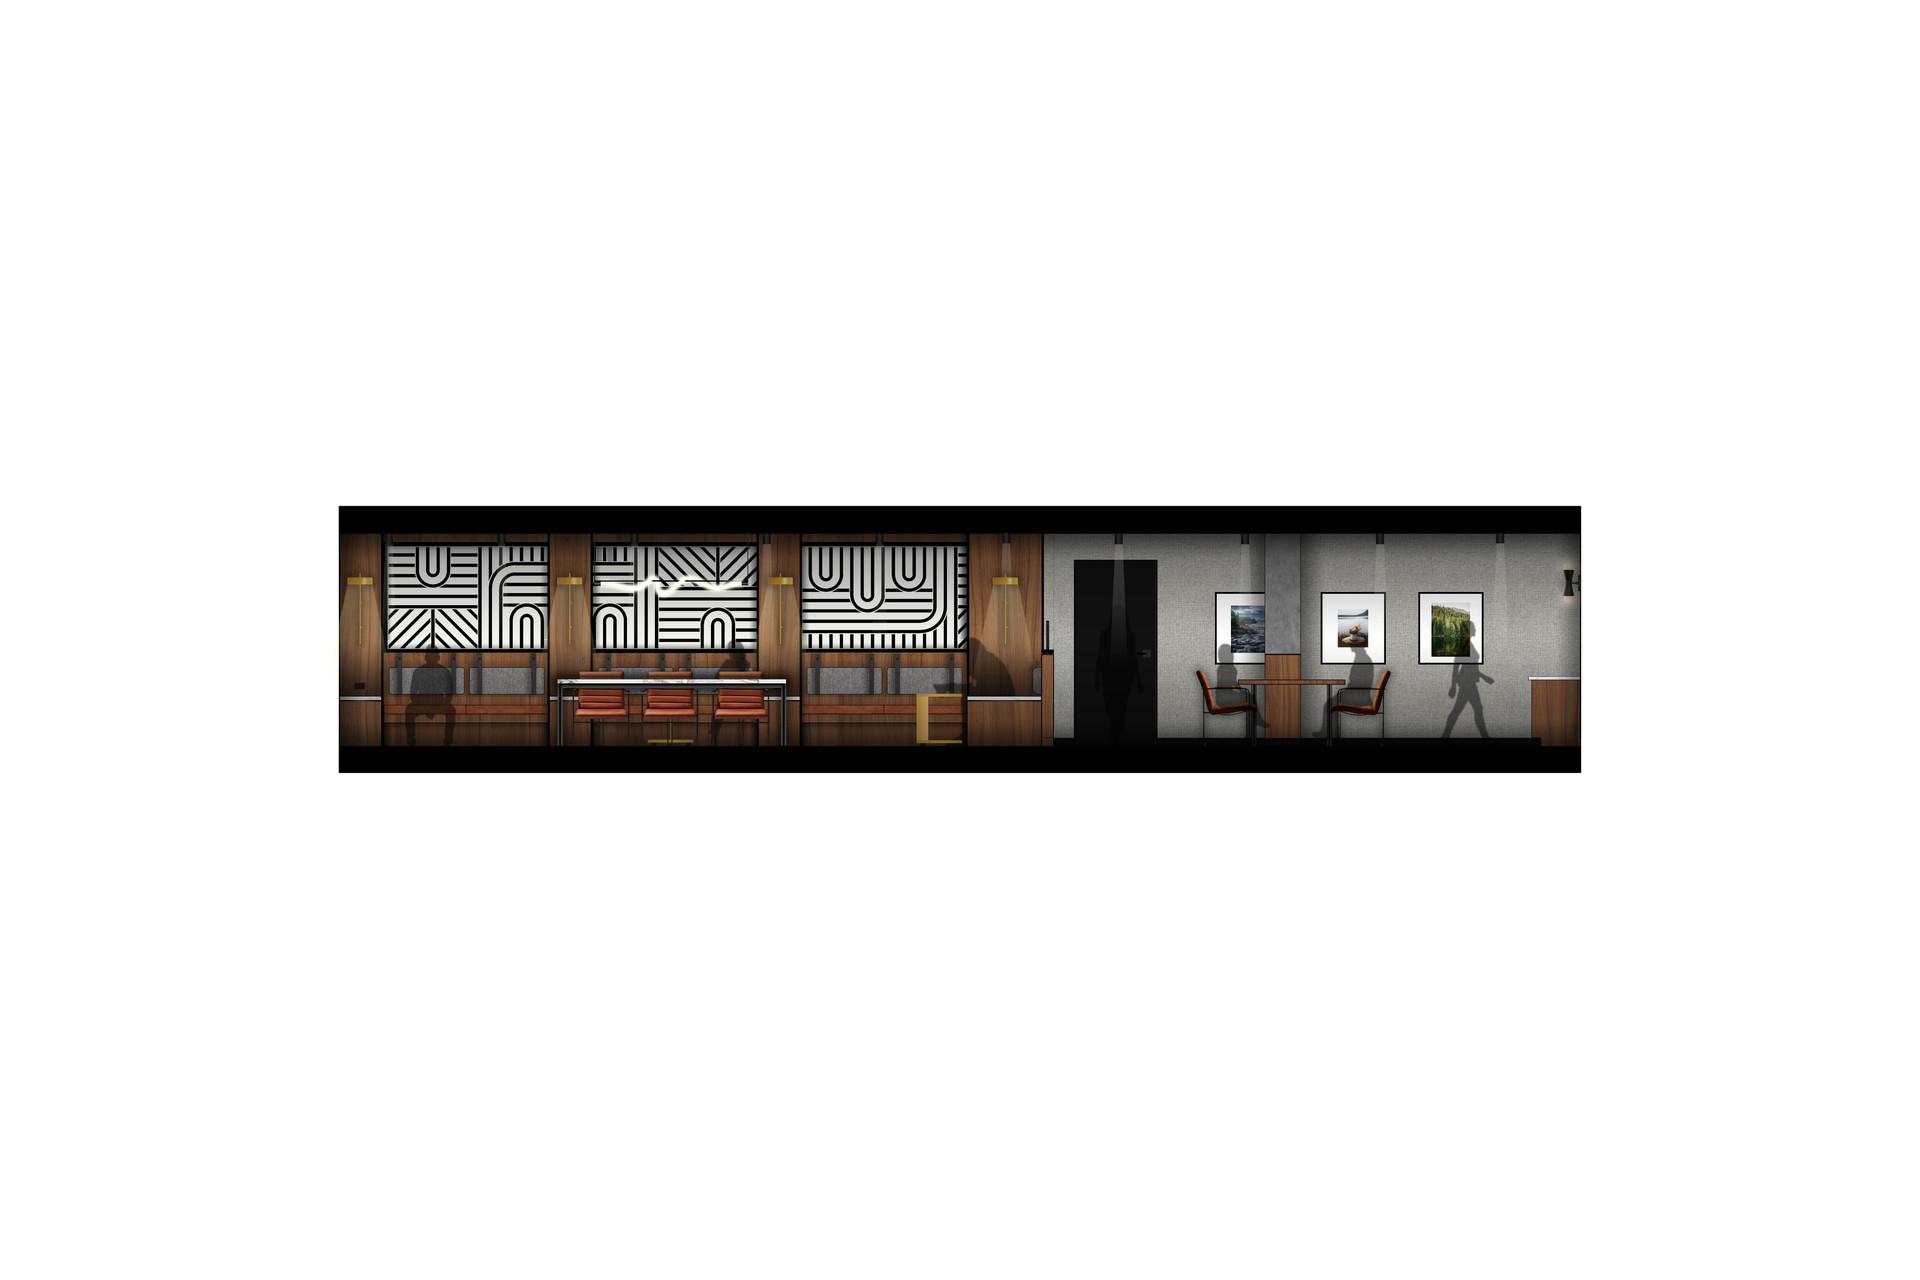 LVL 2 Study Lounge Communal Table_Cognac